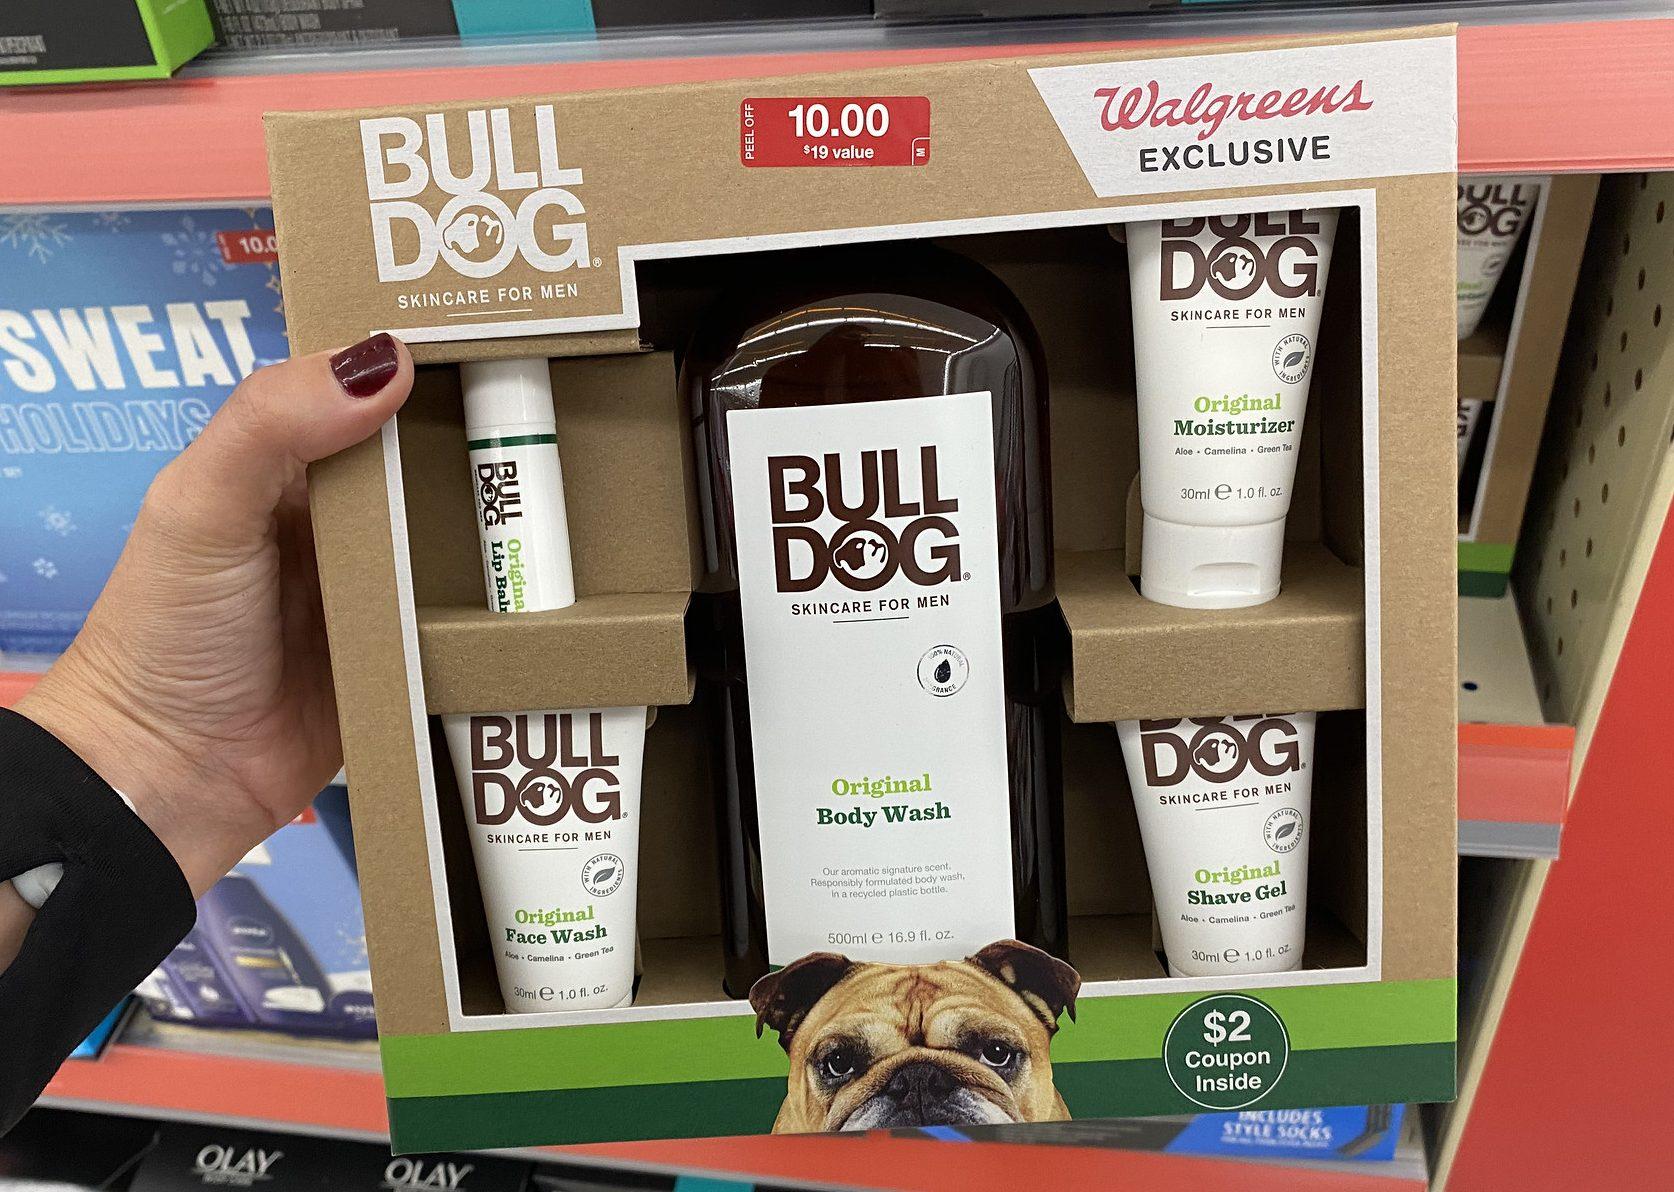 bulldog gift set in hand in store